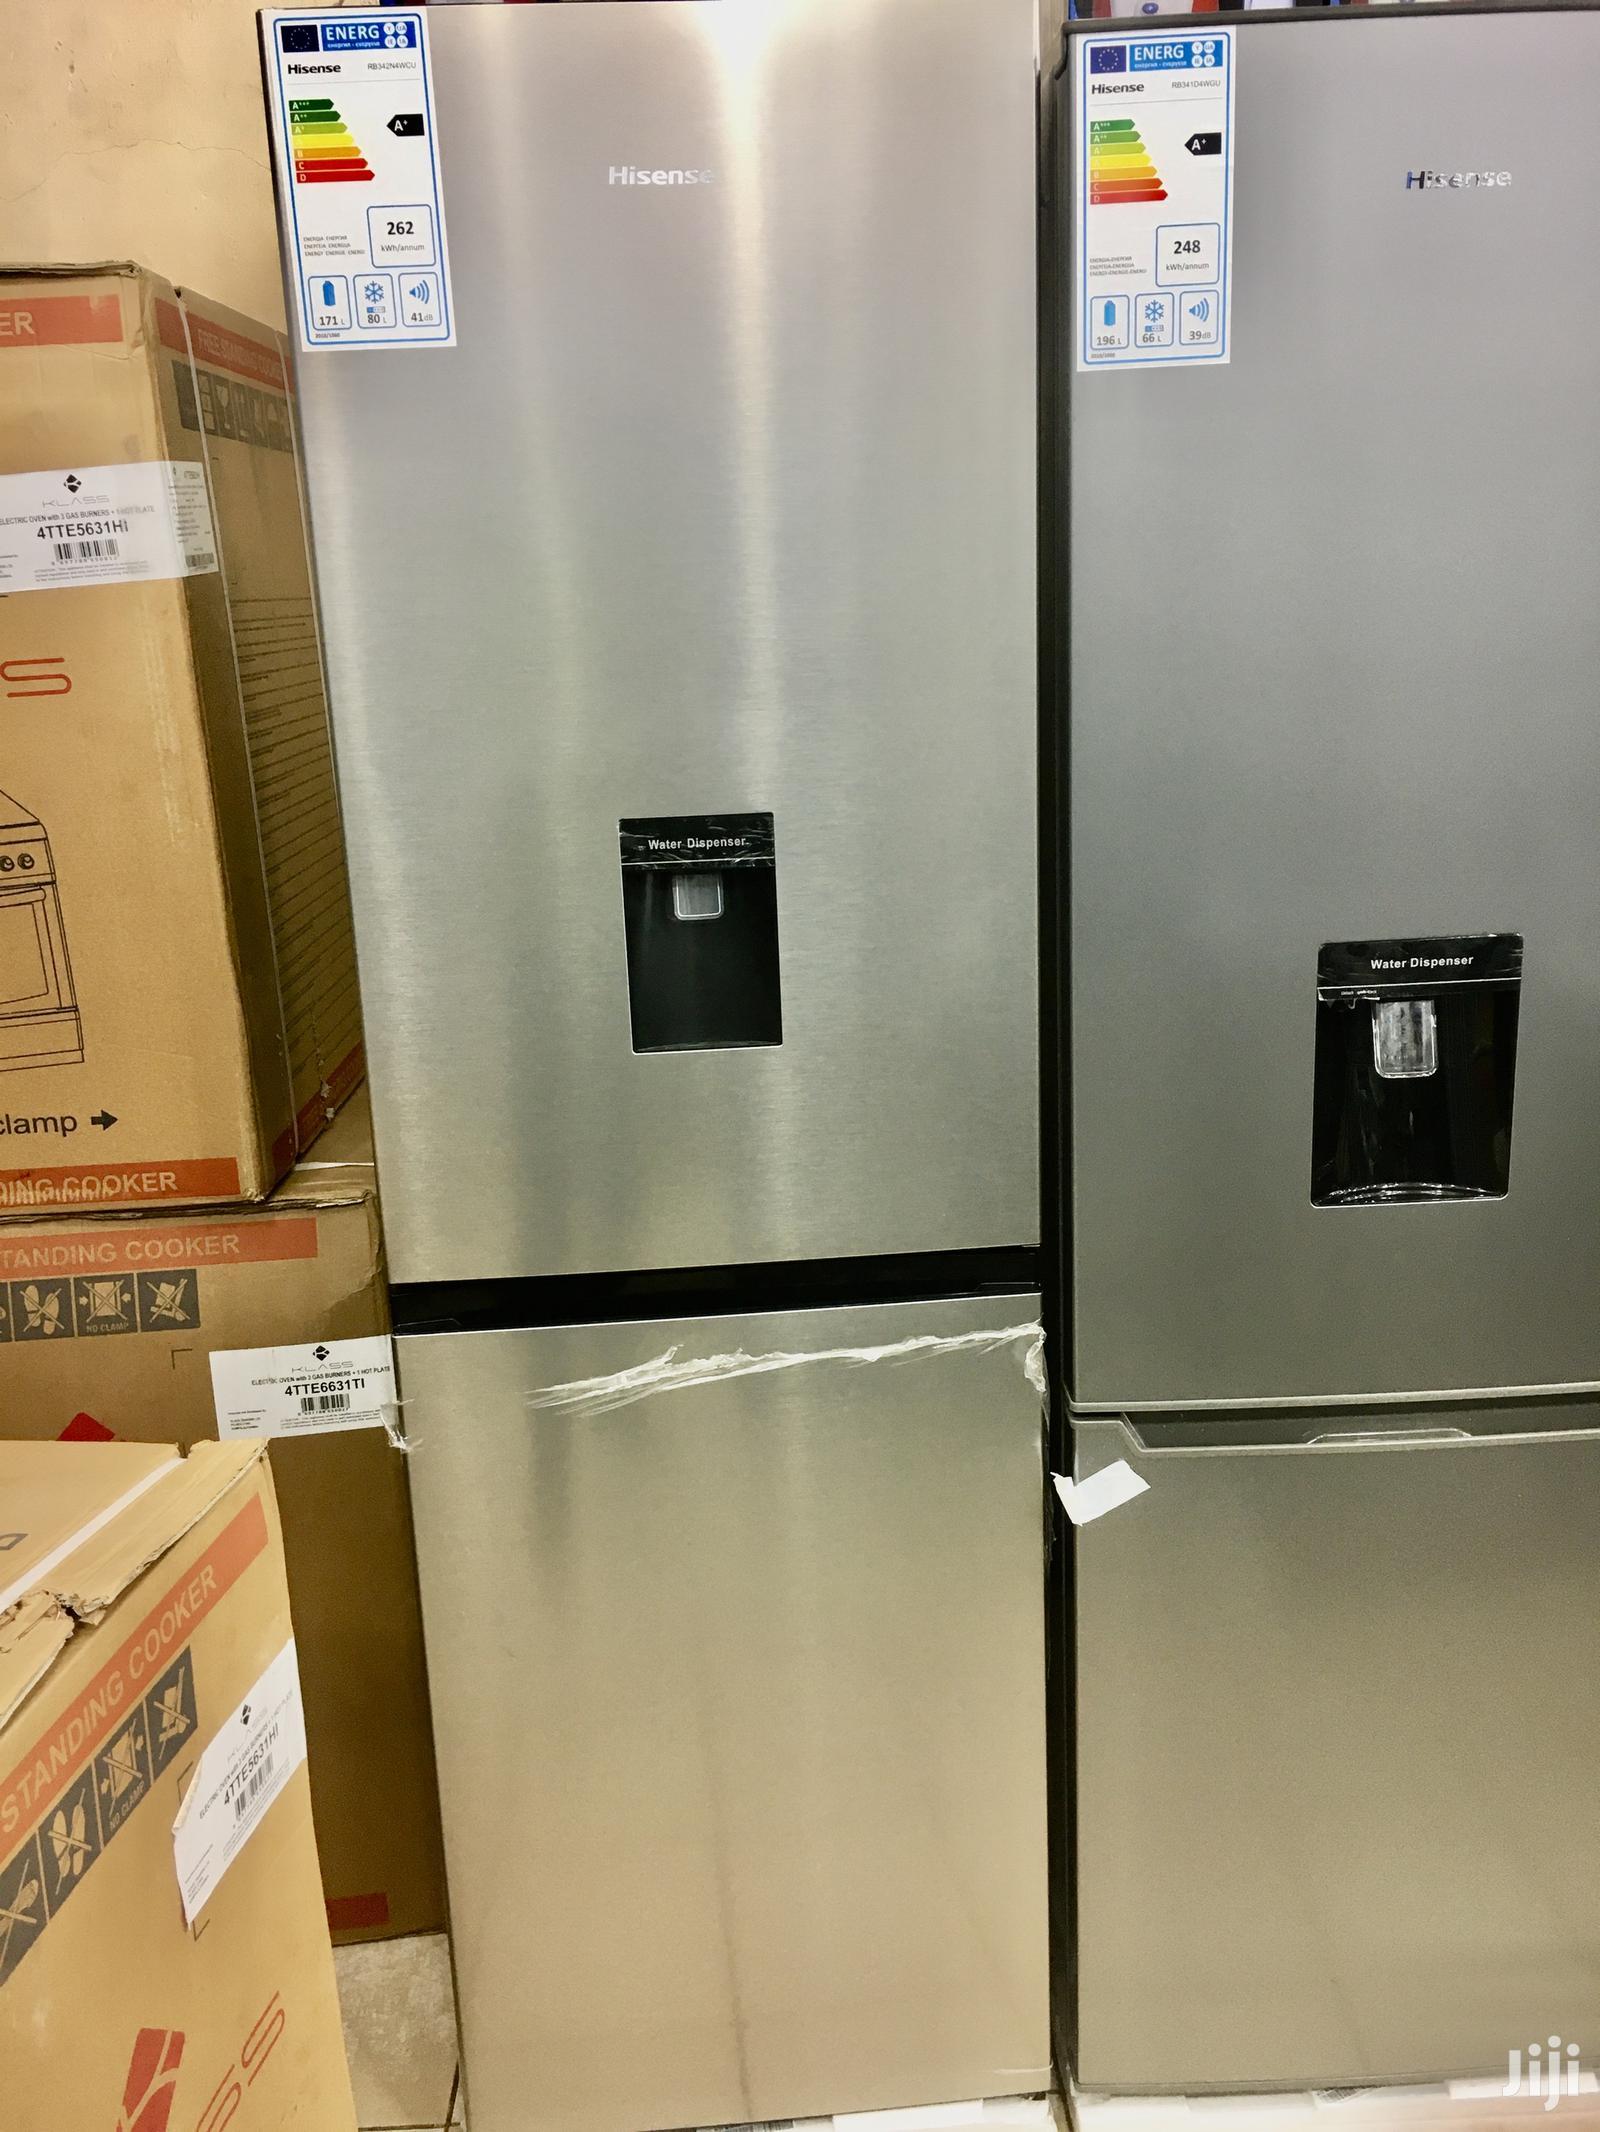 Hisense Fridge 342 Litres Frost Free | Kitchen Appliances for sale in Kampala, Central Region, Uganda